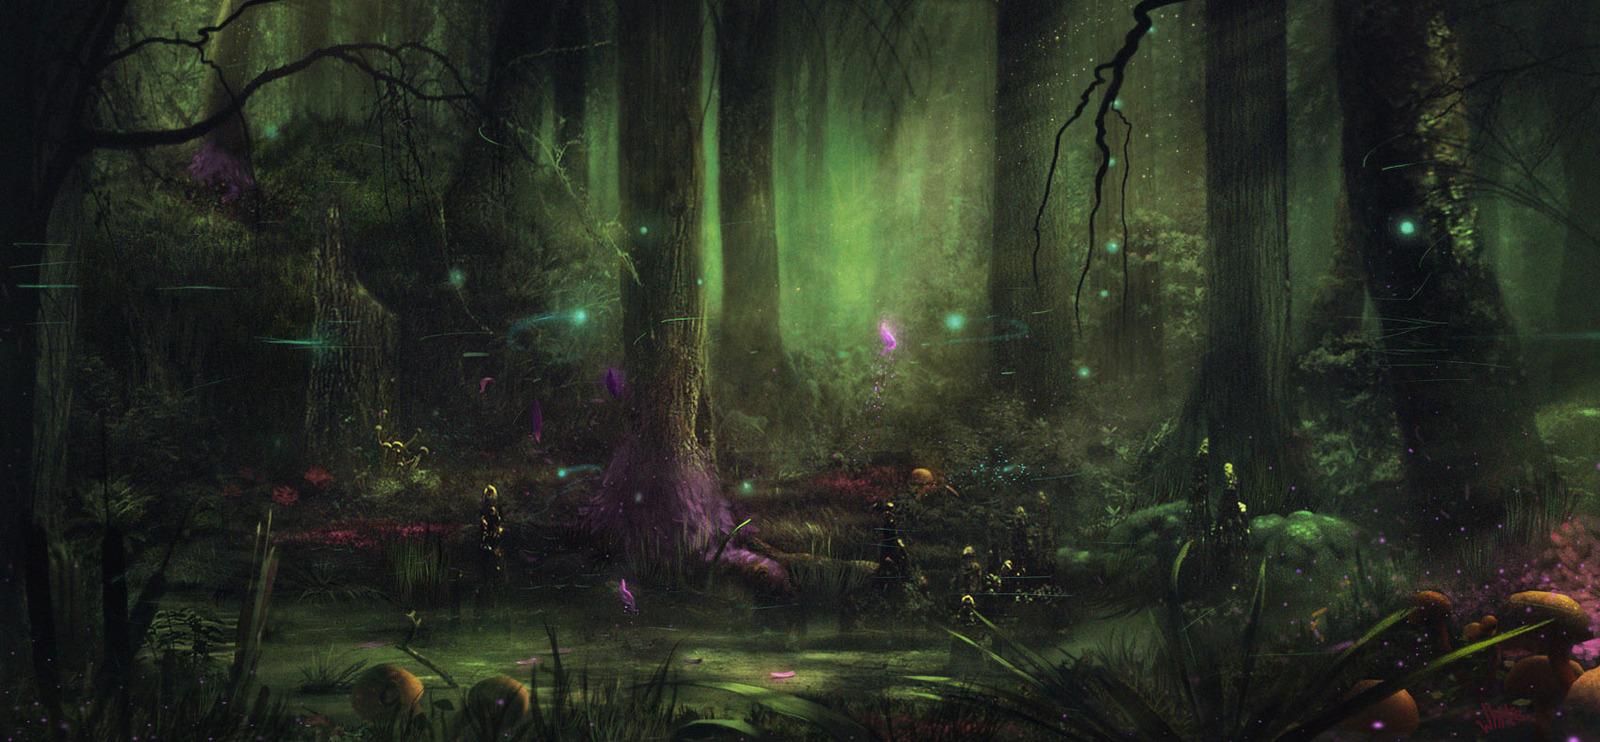 1600x742_7119_Fairytale_swamp_2d_landsca